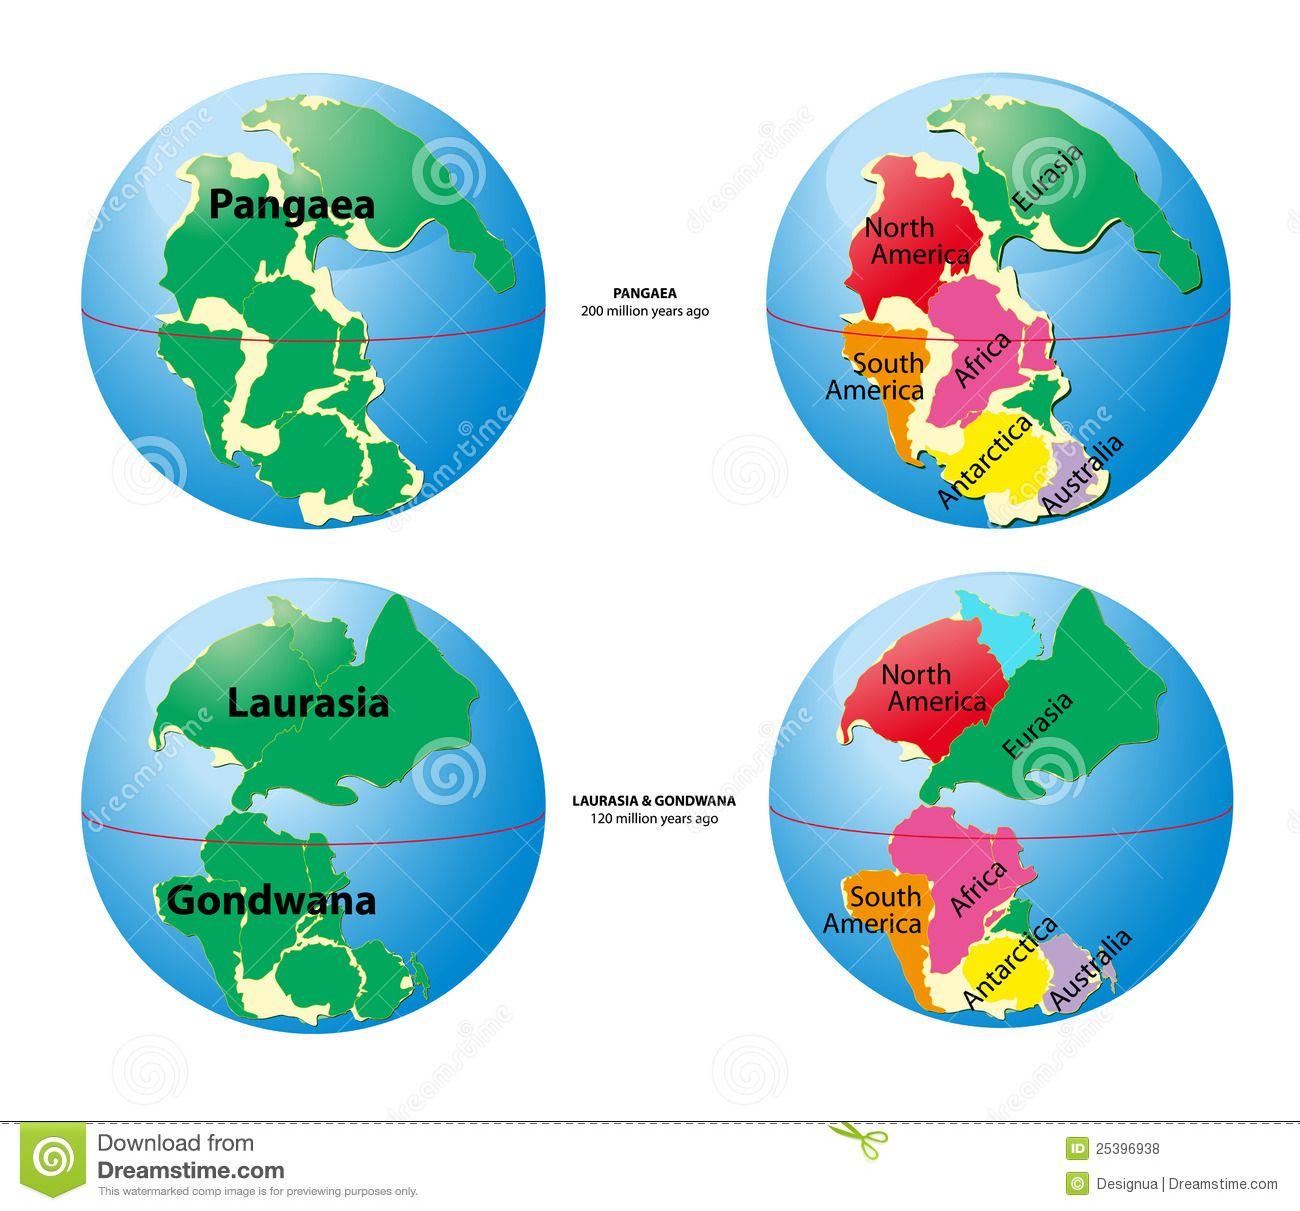 World map of pangaea laurasia gondwana royalty free stock photos world map of pangaea laurasia gondwana royalty free stock photos image 25396938 publicscrutiny Choice Image